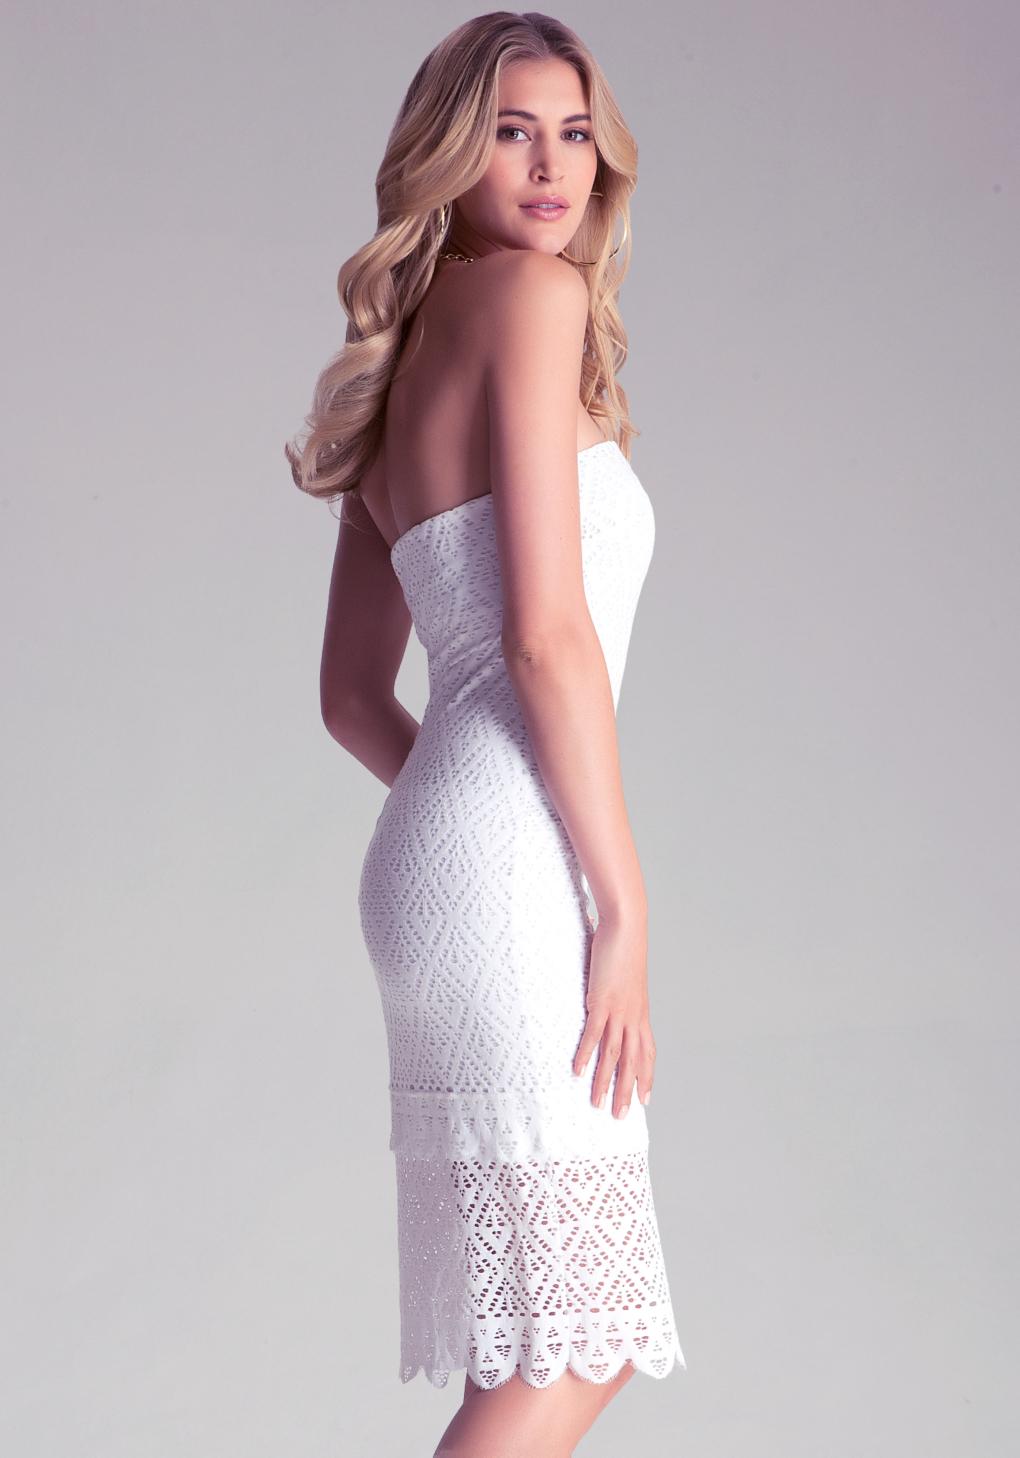 4c2938b5d1b7 Bebe Strapless Susie Midi Dress in White - Lyst